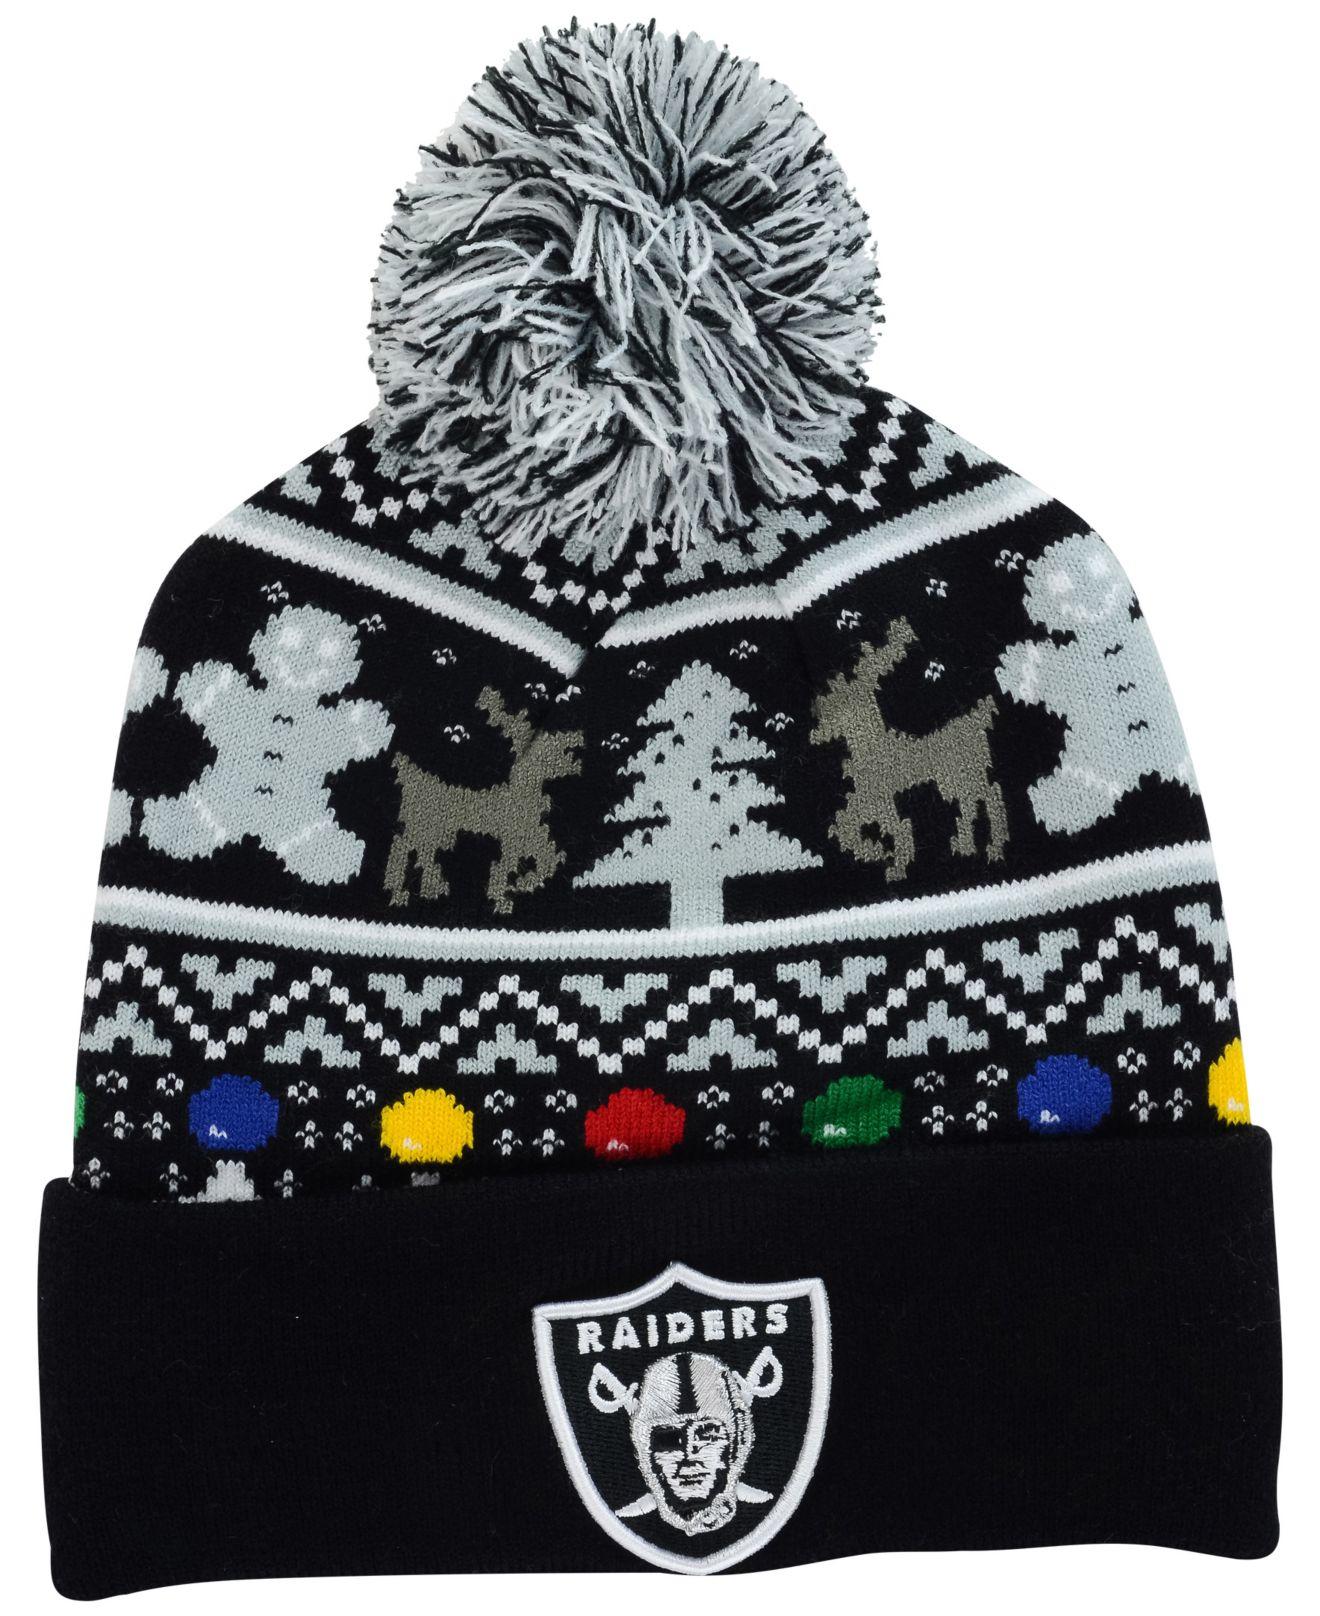 Lyst Ktz Oakland Raiders Christmas Sweater Pom Knit Hat In Black